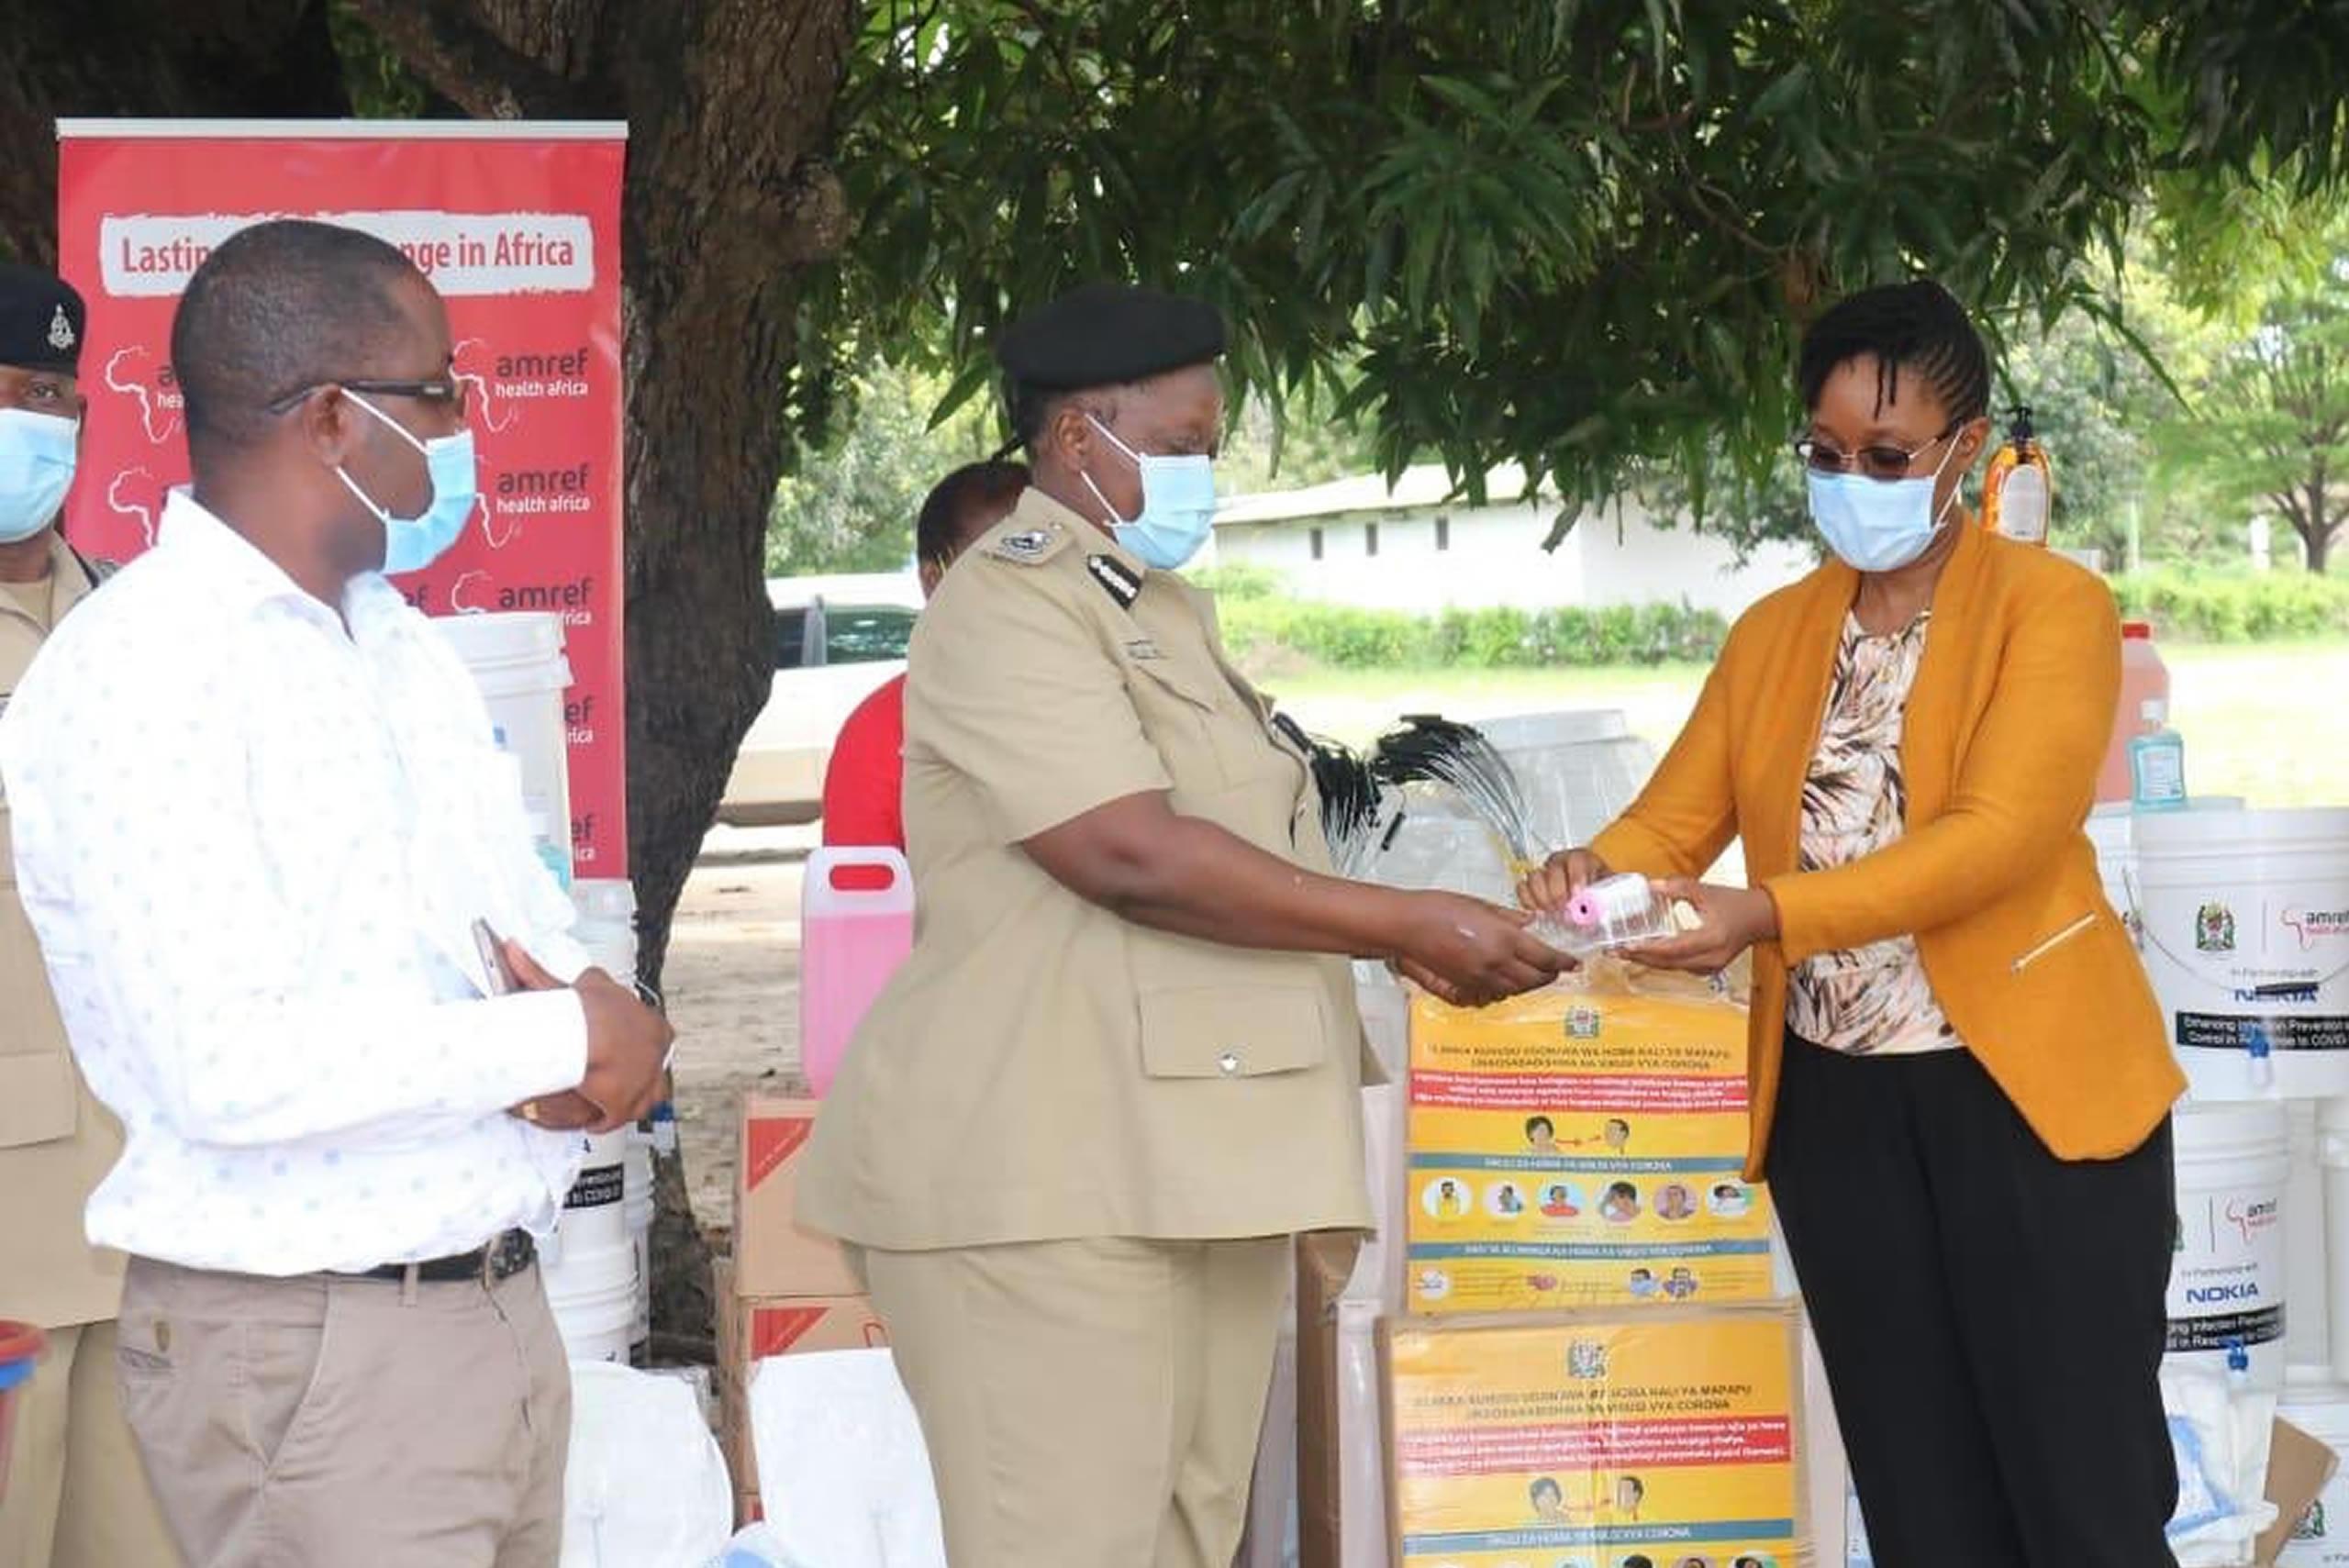 Amref Tanzania Coronavirus disease (COVID-19) Africa Information Centre